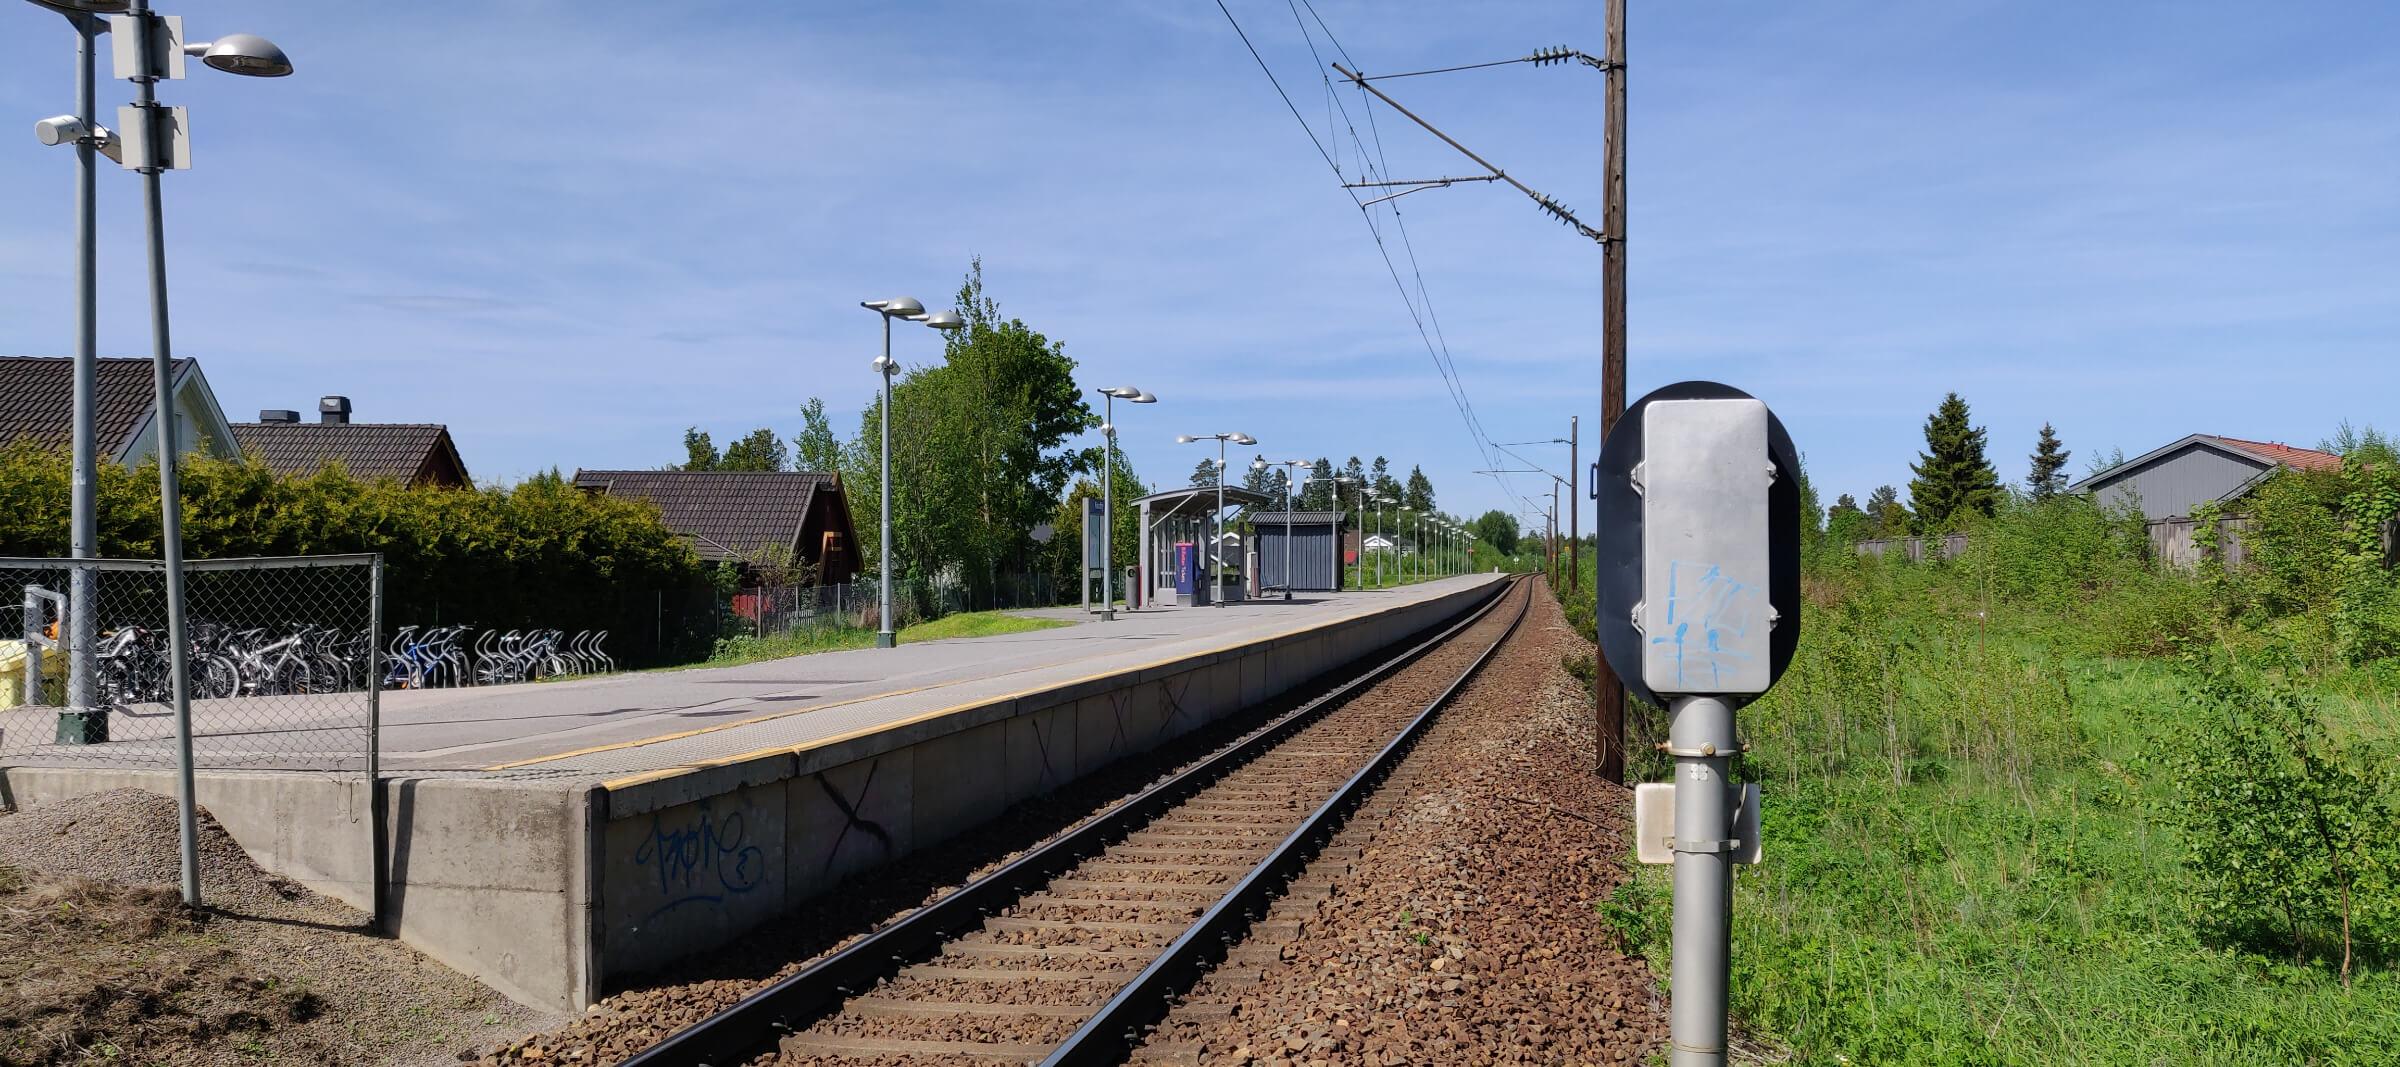 Nordby Togstasjon